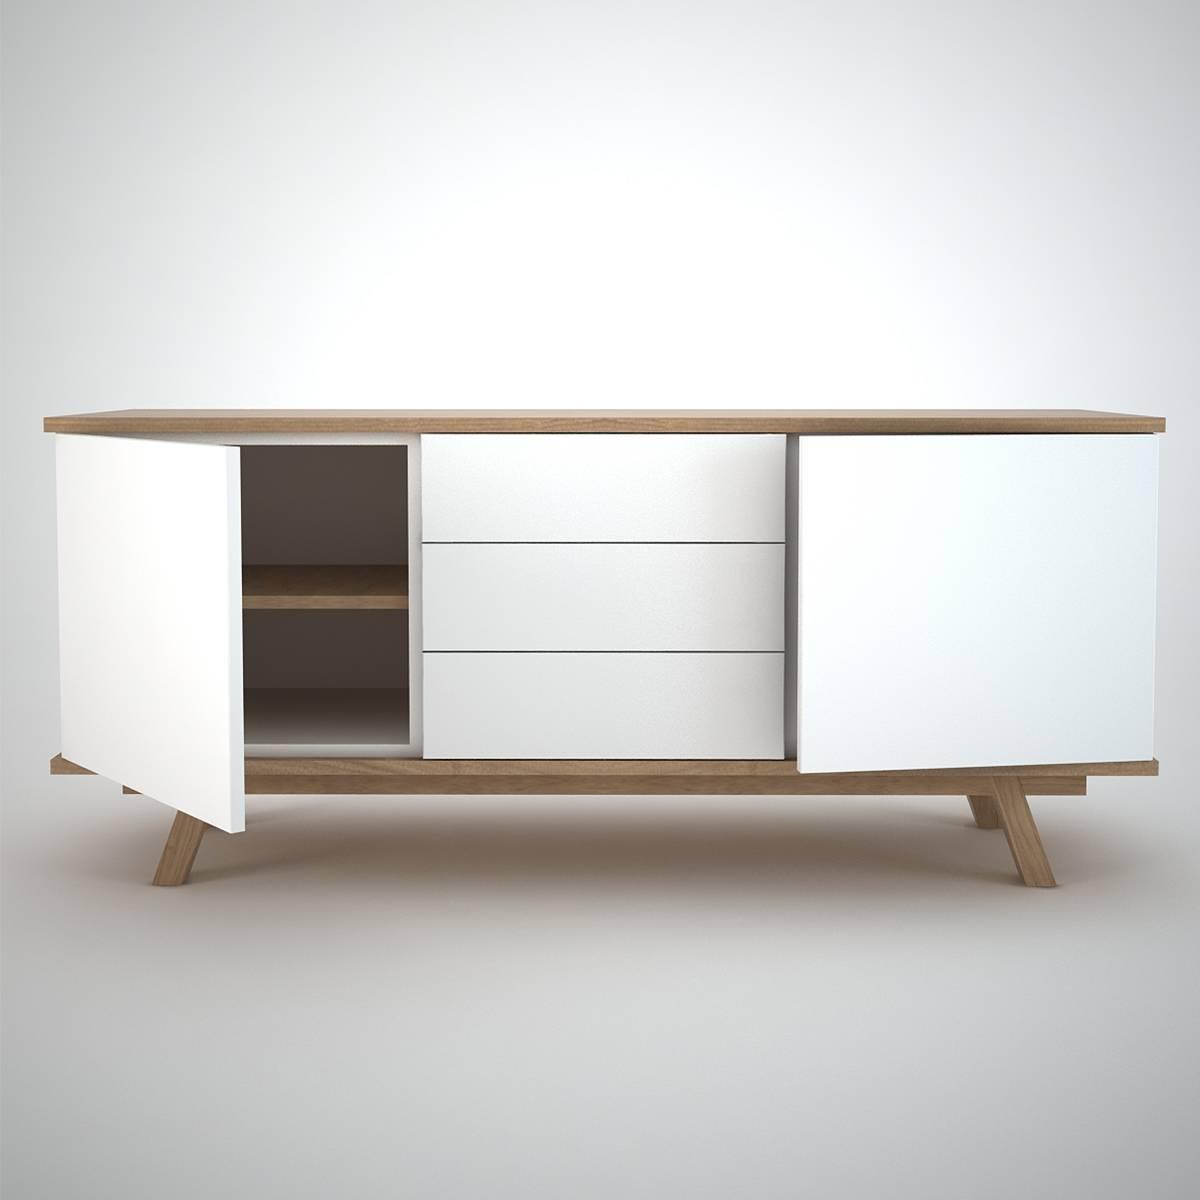 Ottawa Sideboard (2+3) White - Join Furniture pertaining to White Sideboard Furniture (Image 16 of 30)